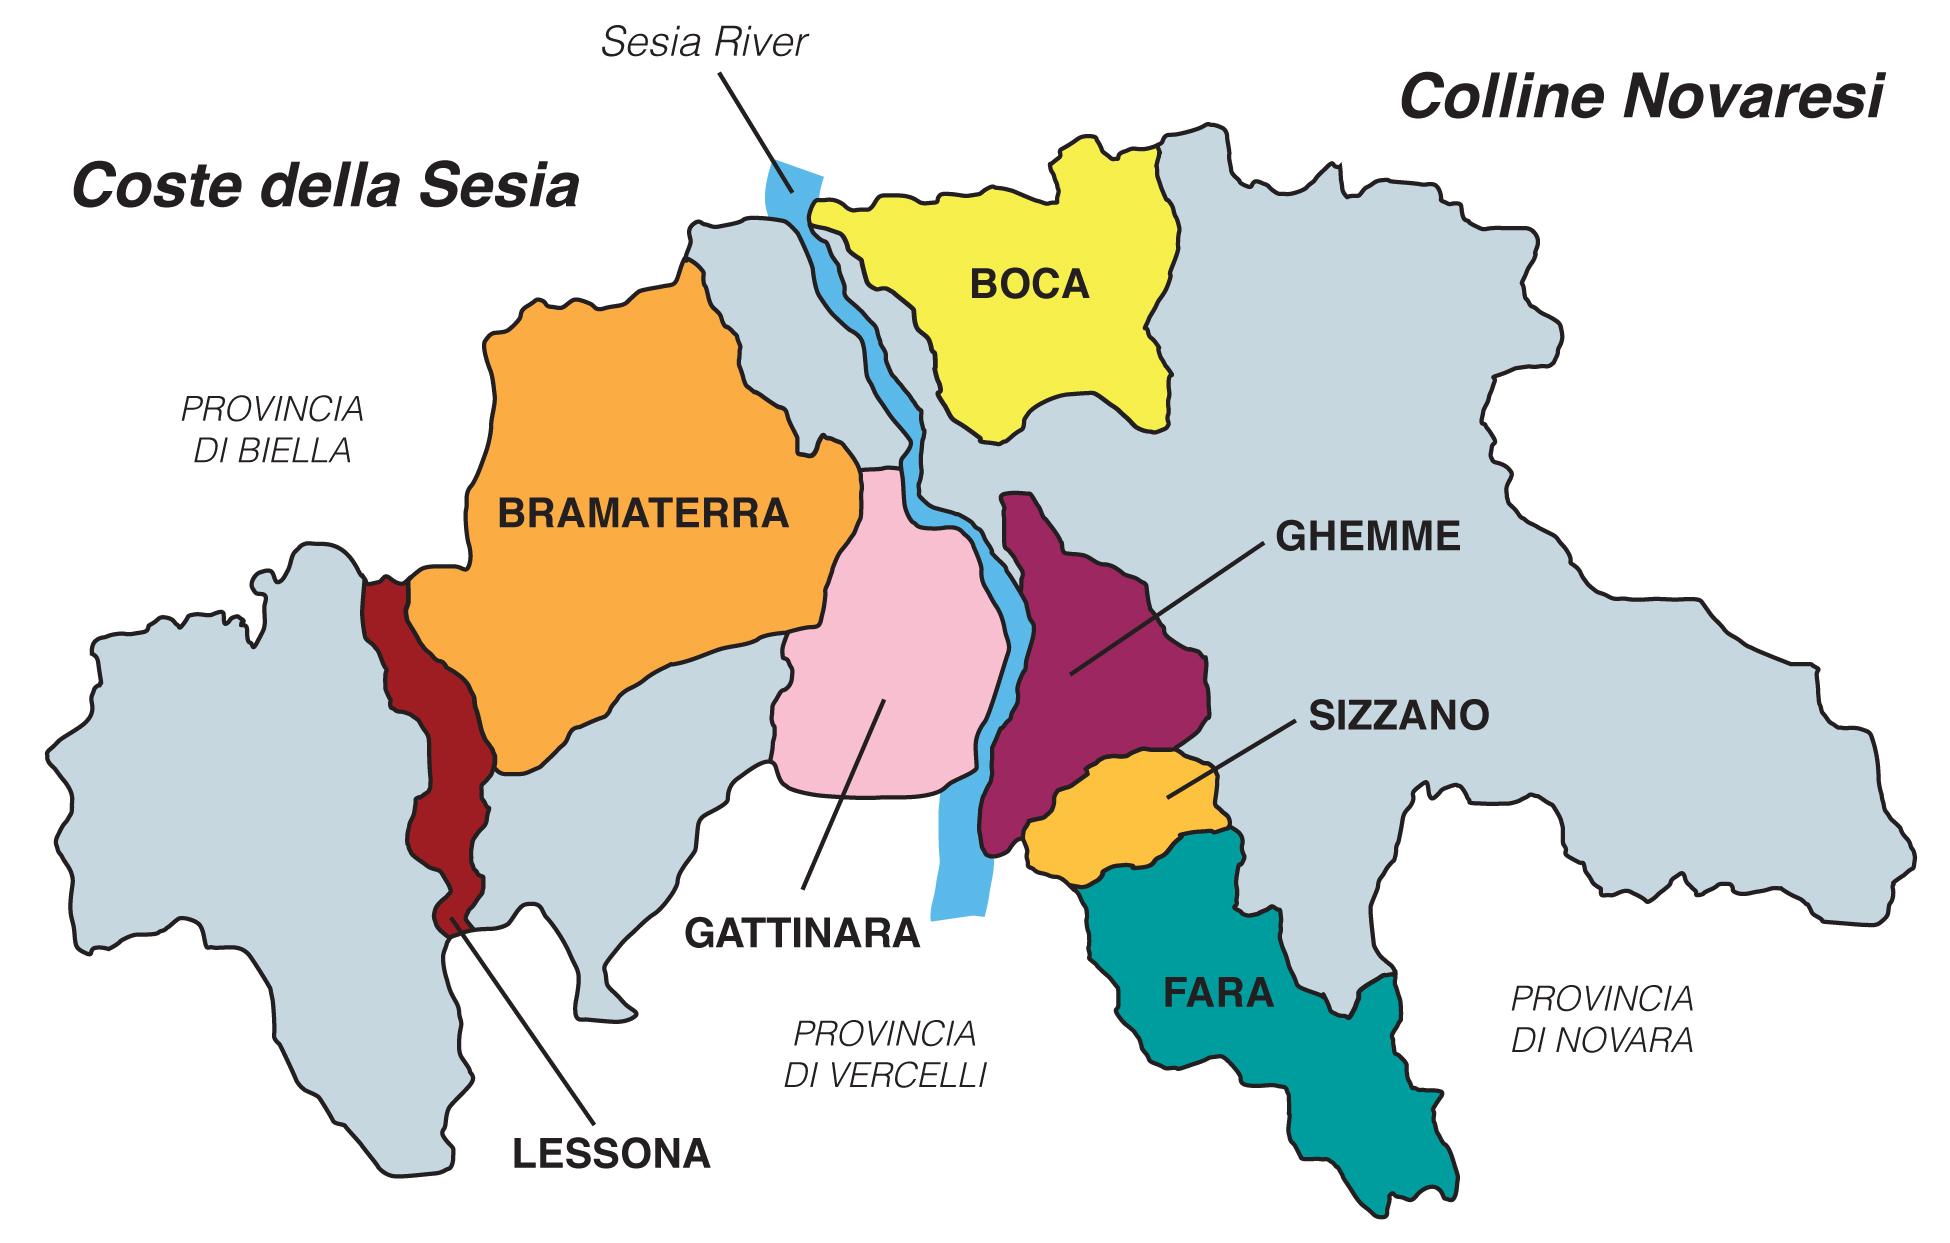 Colline-Novaresi-Sesia.jpg